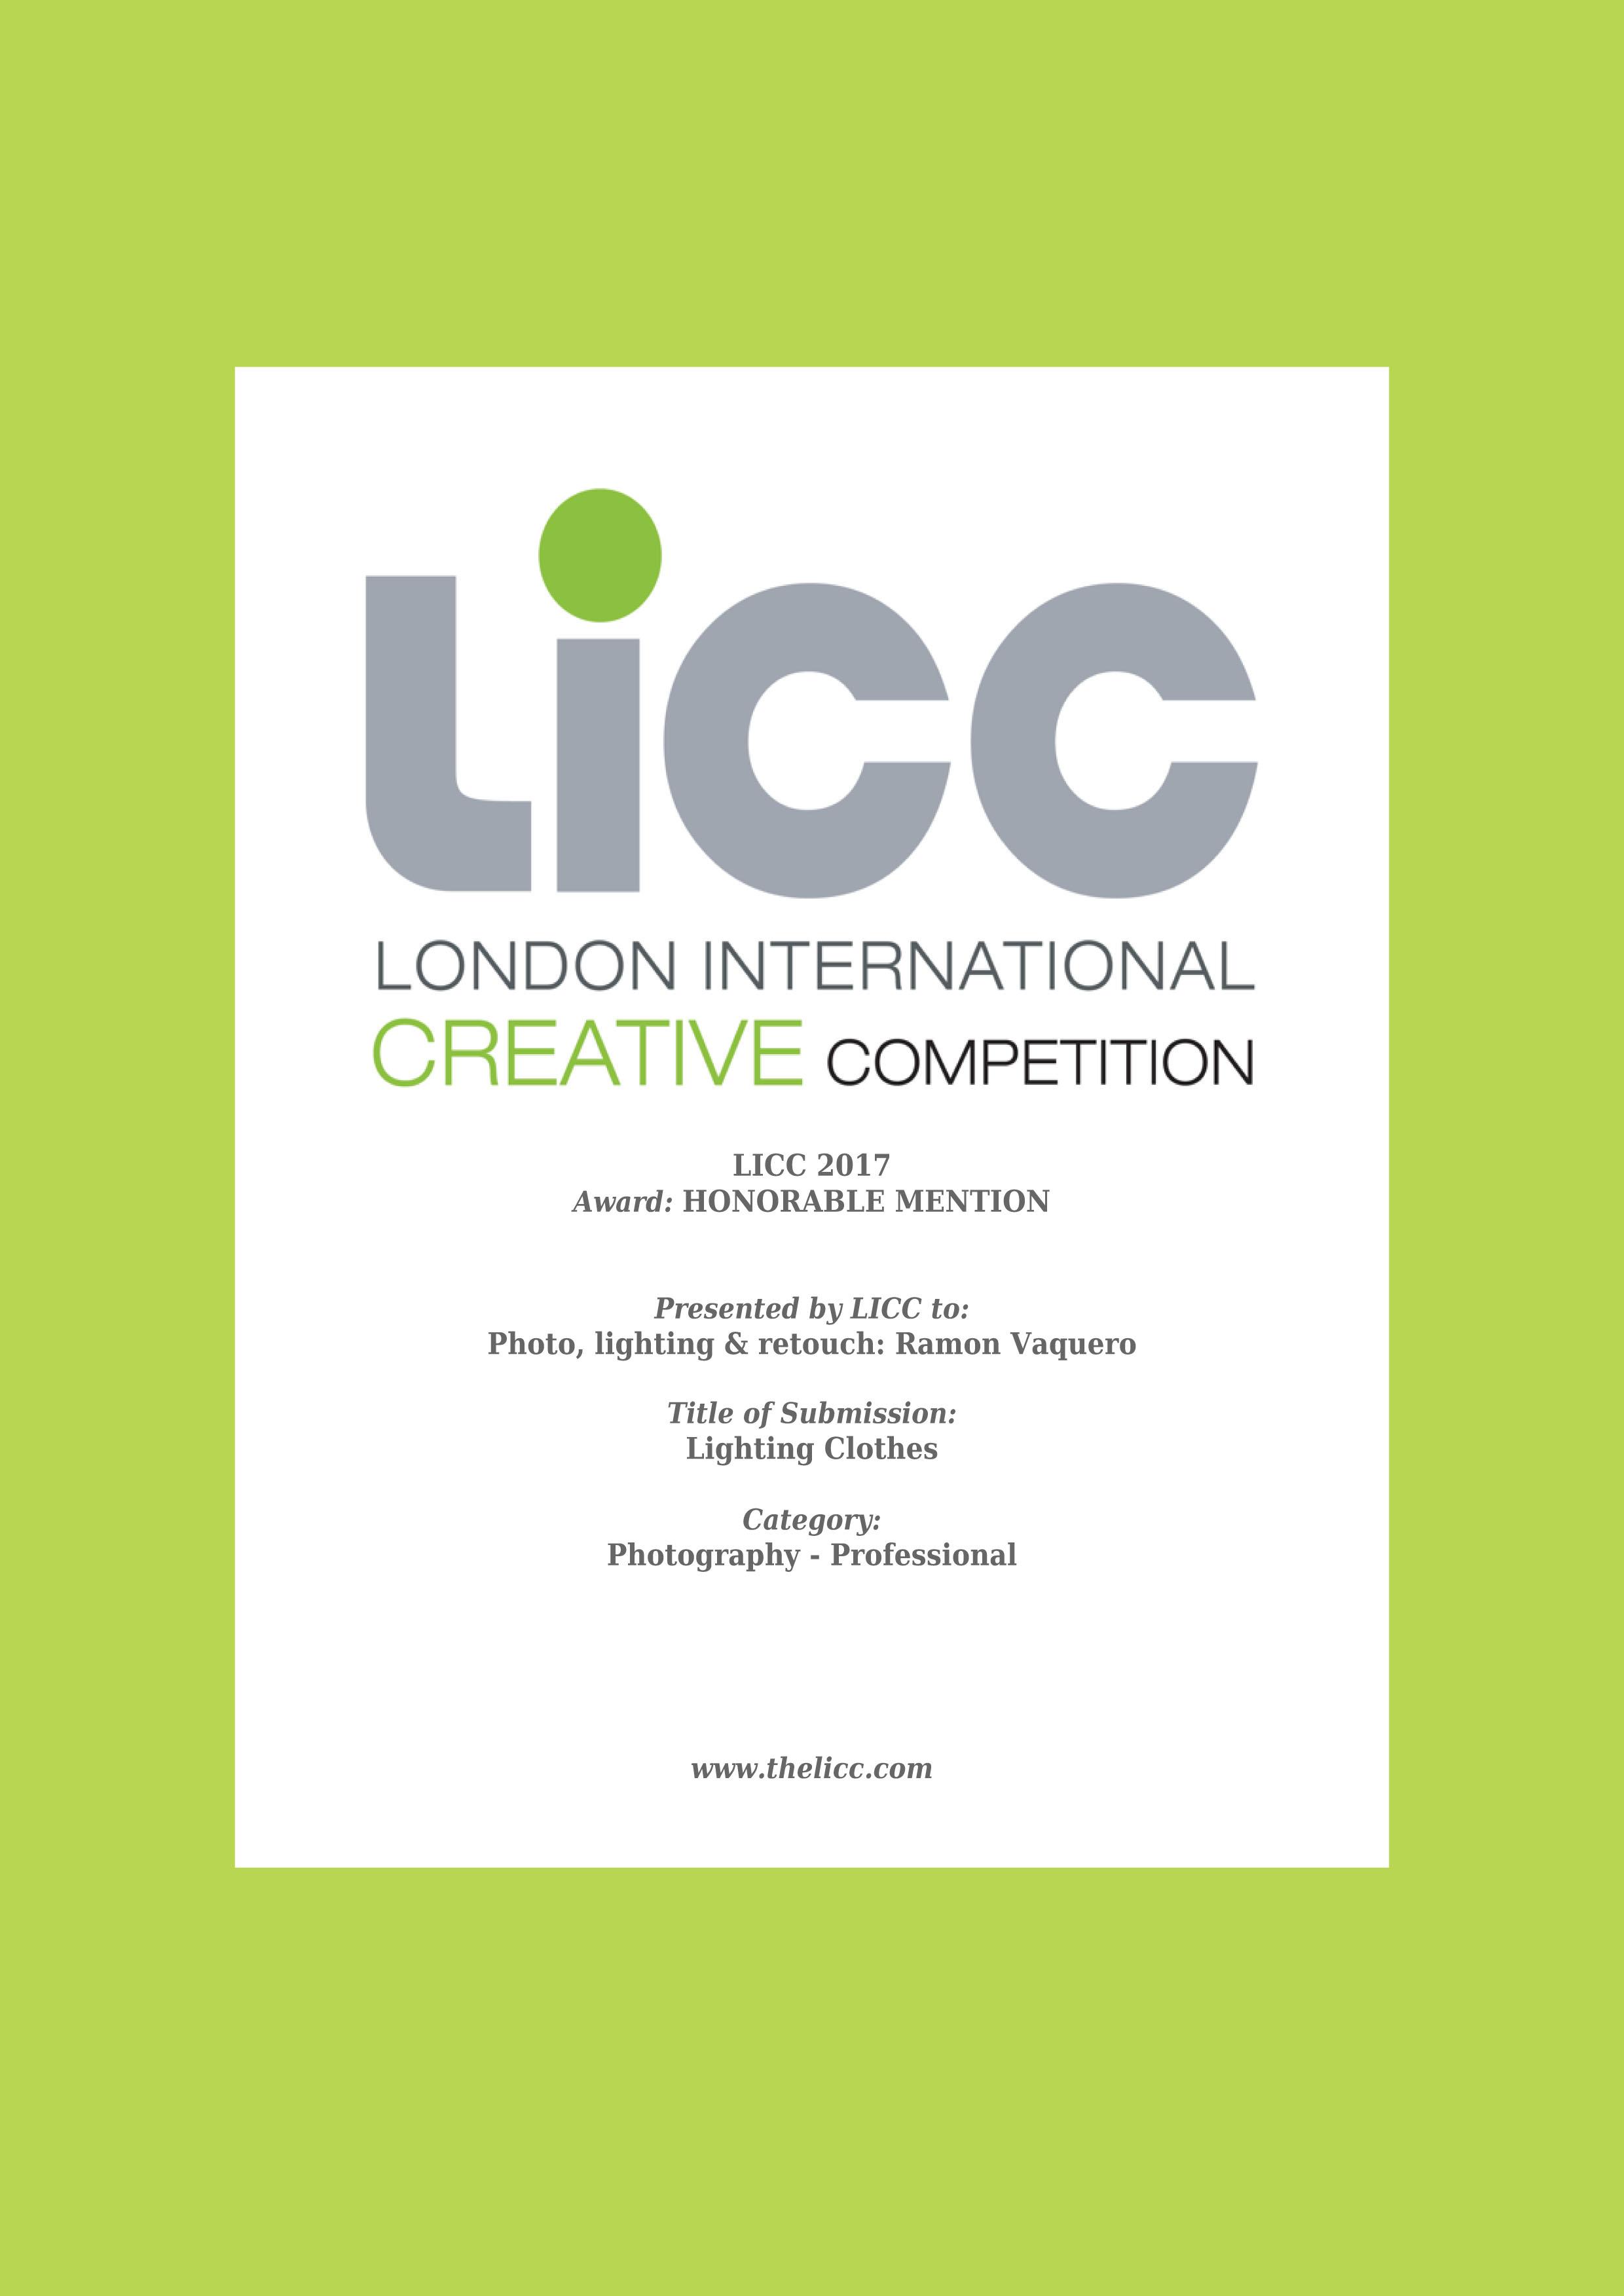 Ramon_Vaquero_fotografos_vigo_premios_LICC_London